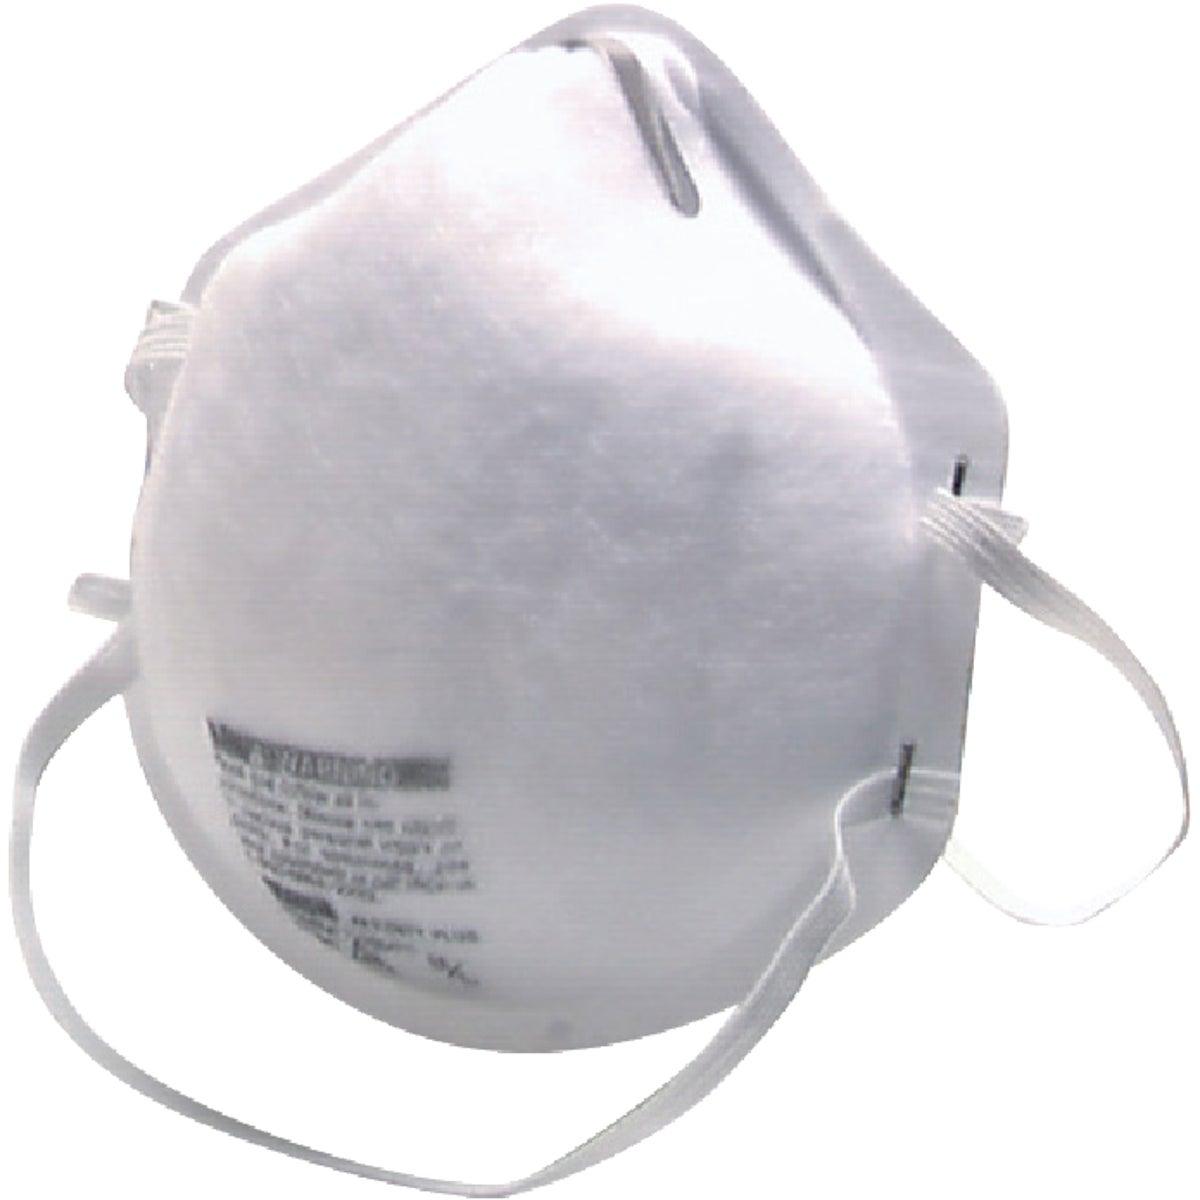 20PK N95 RESPIRATOR - 10102481 by Msa Safety